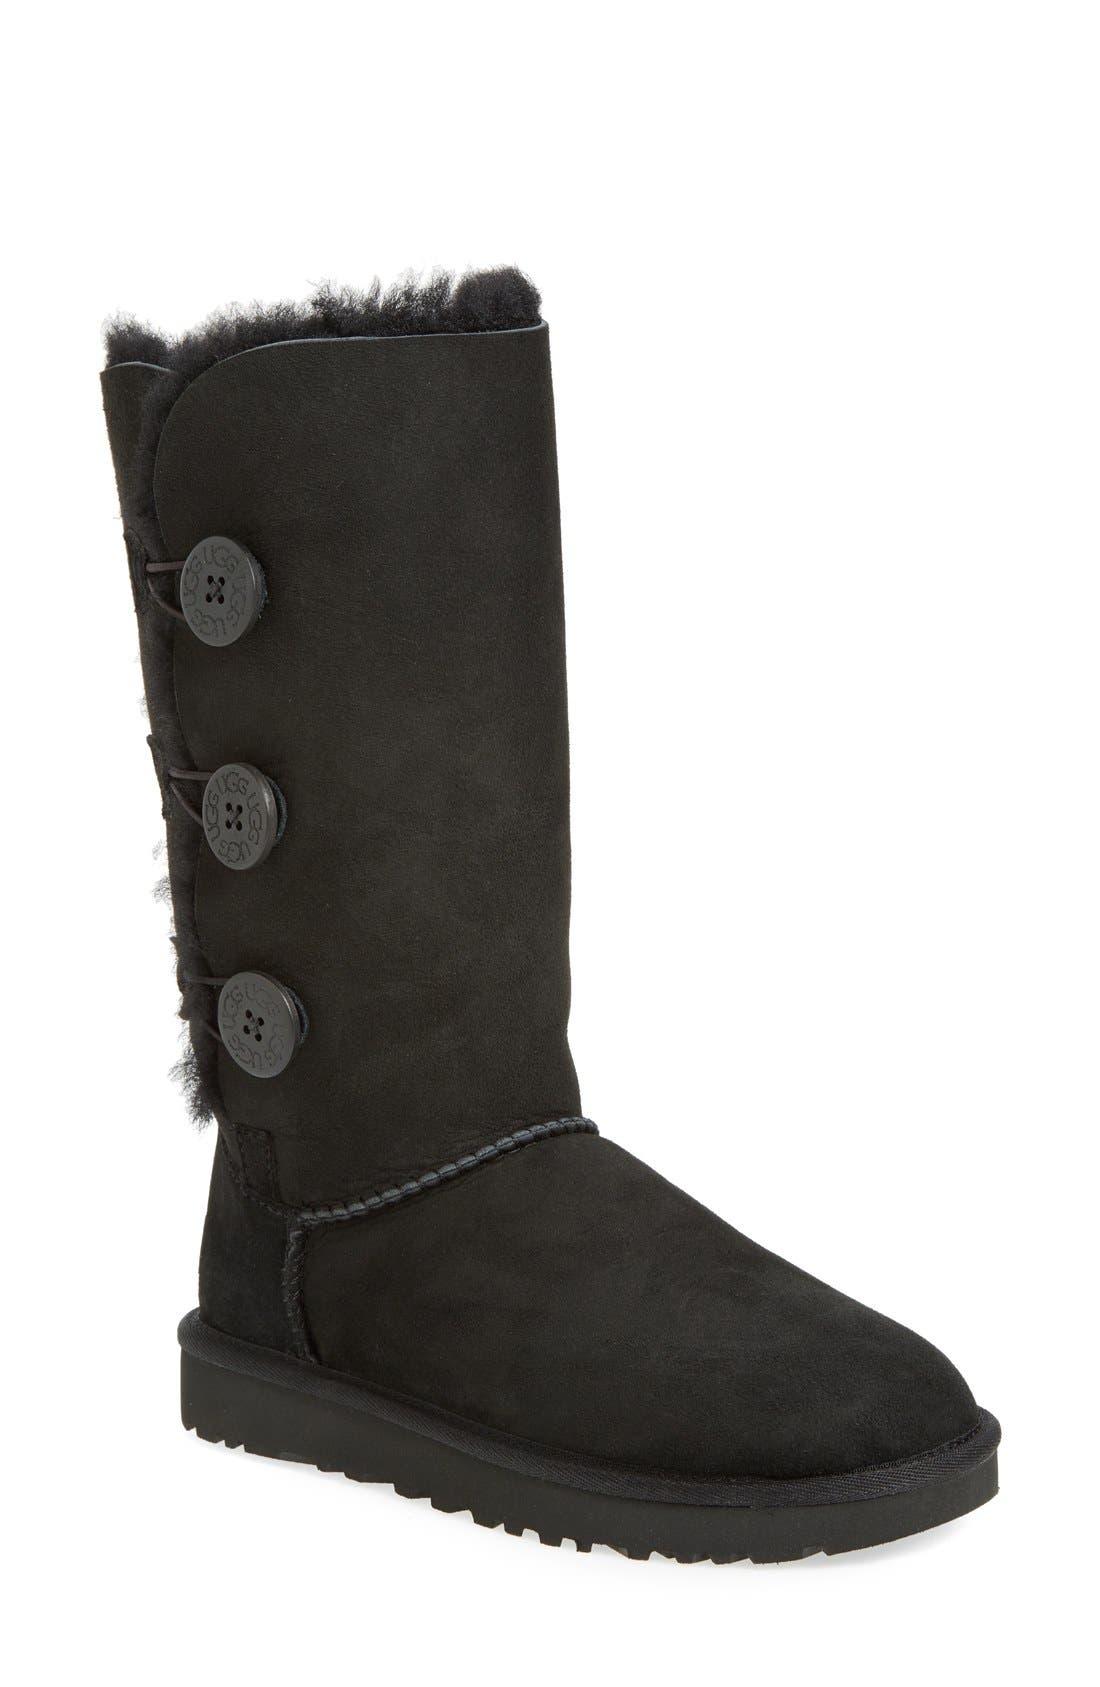 Ugg Bailey Button Triplet Ii Genuine Shearling Boot, Black